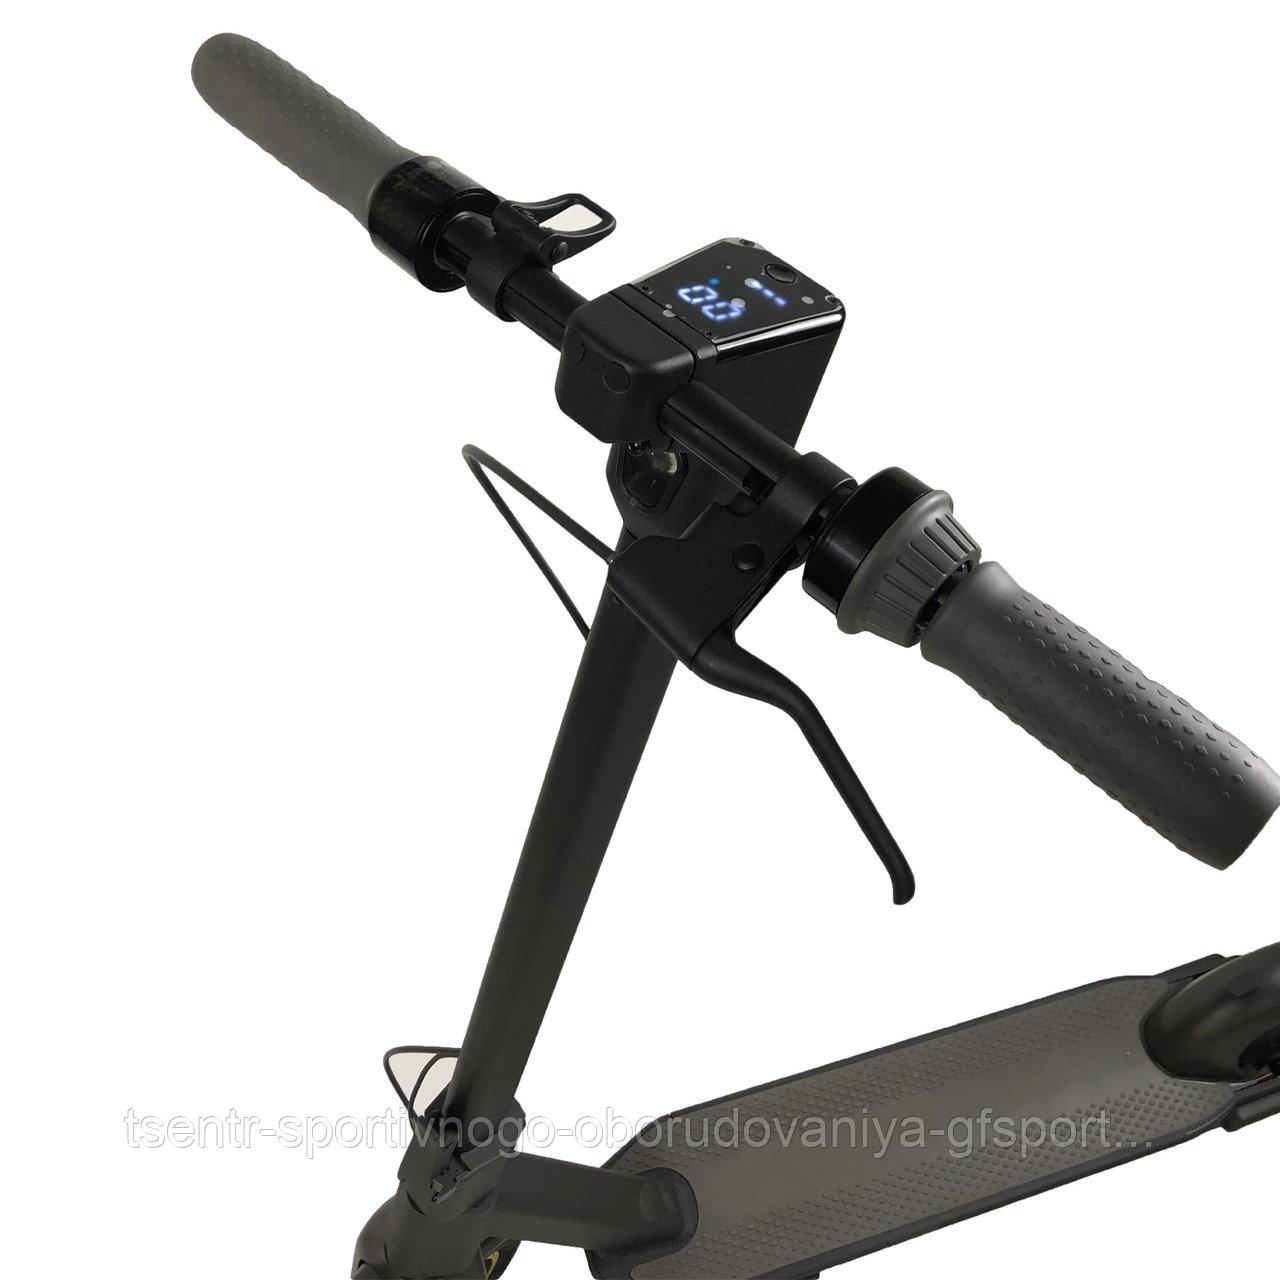 Электросамокат GF-Scooter Max RR-30 - фото 5